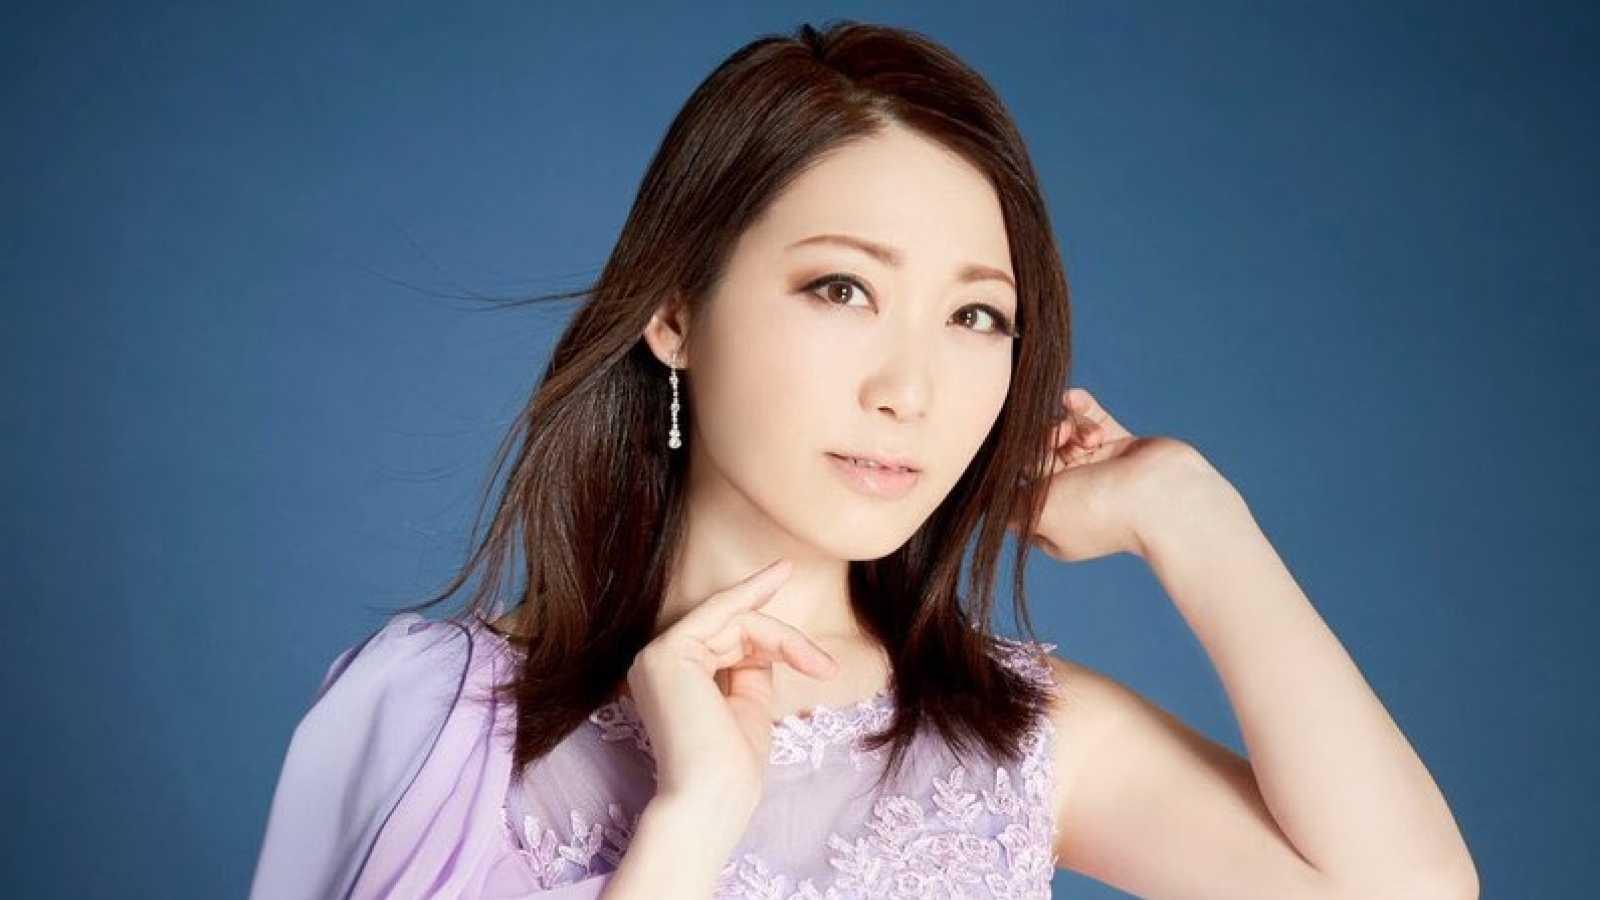 Nowy singiel Minami Kuribayashi © Lantis. All rights reserved.